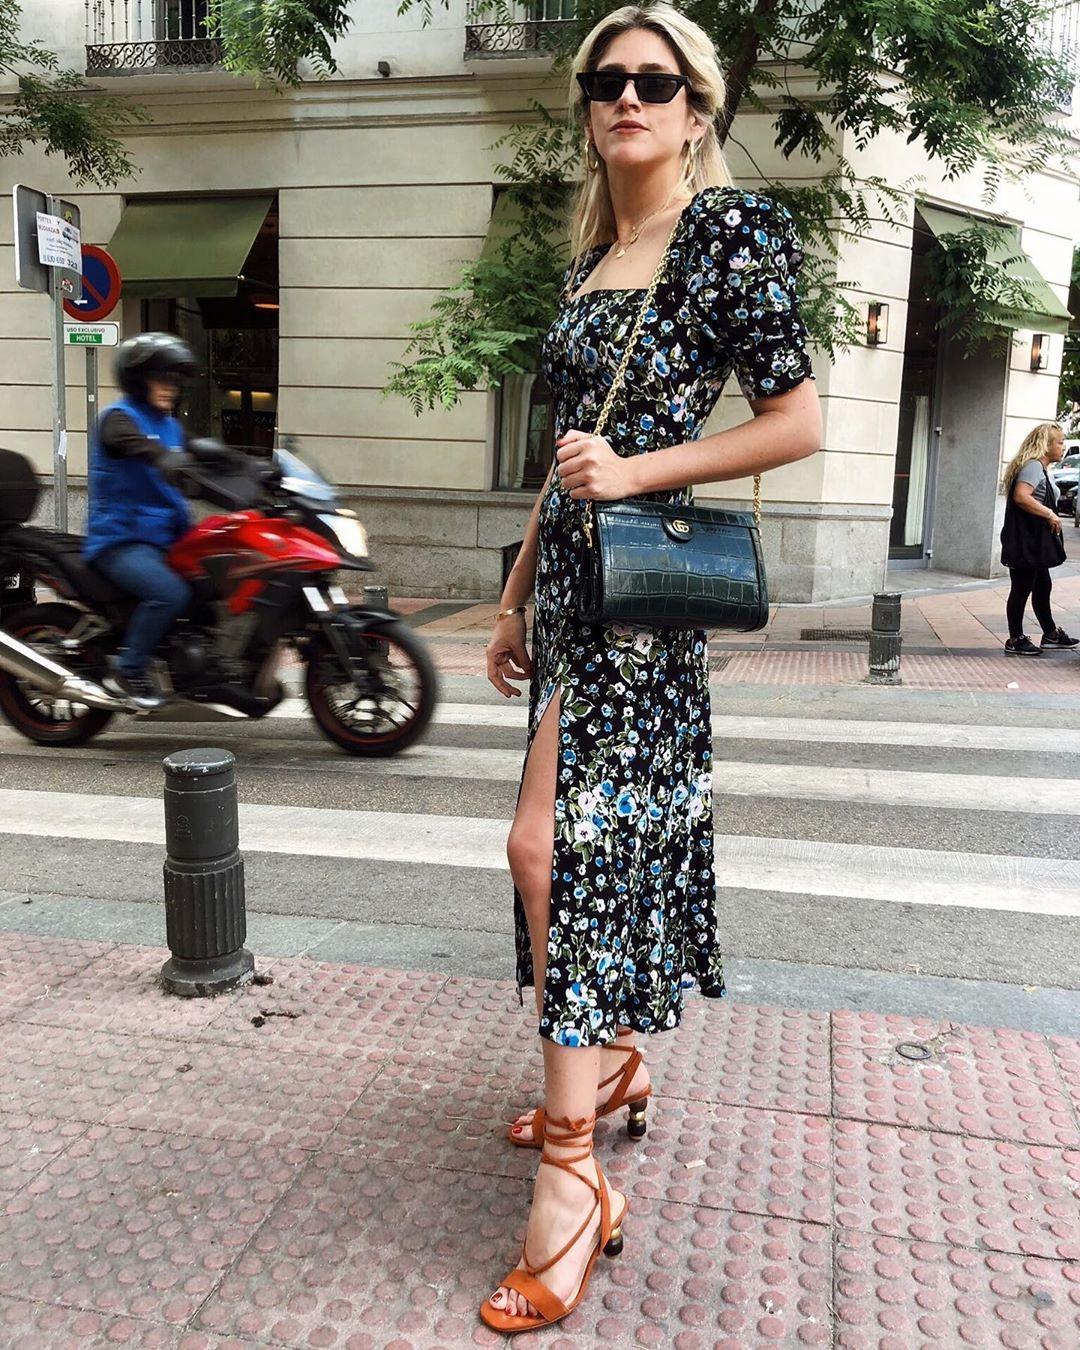 BLACK & BLUE IN MADRID